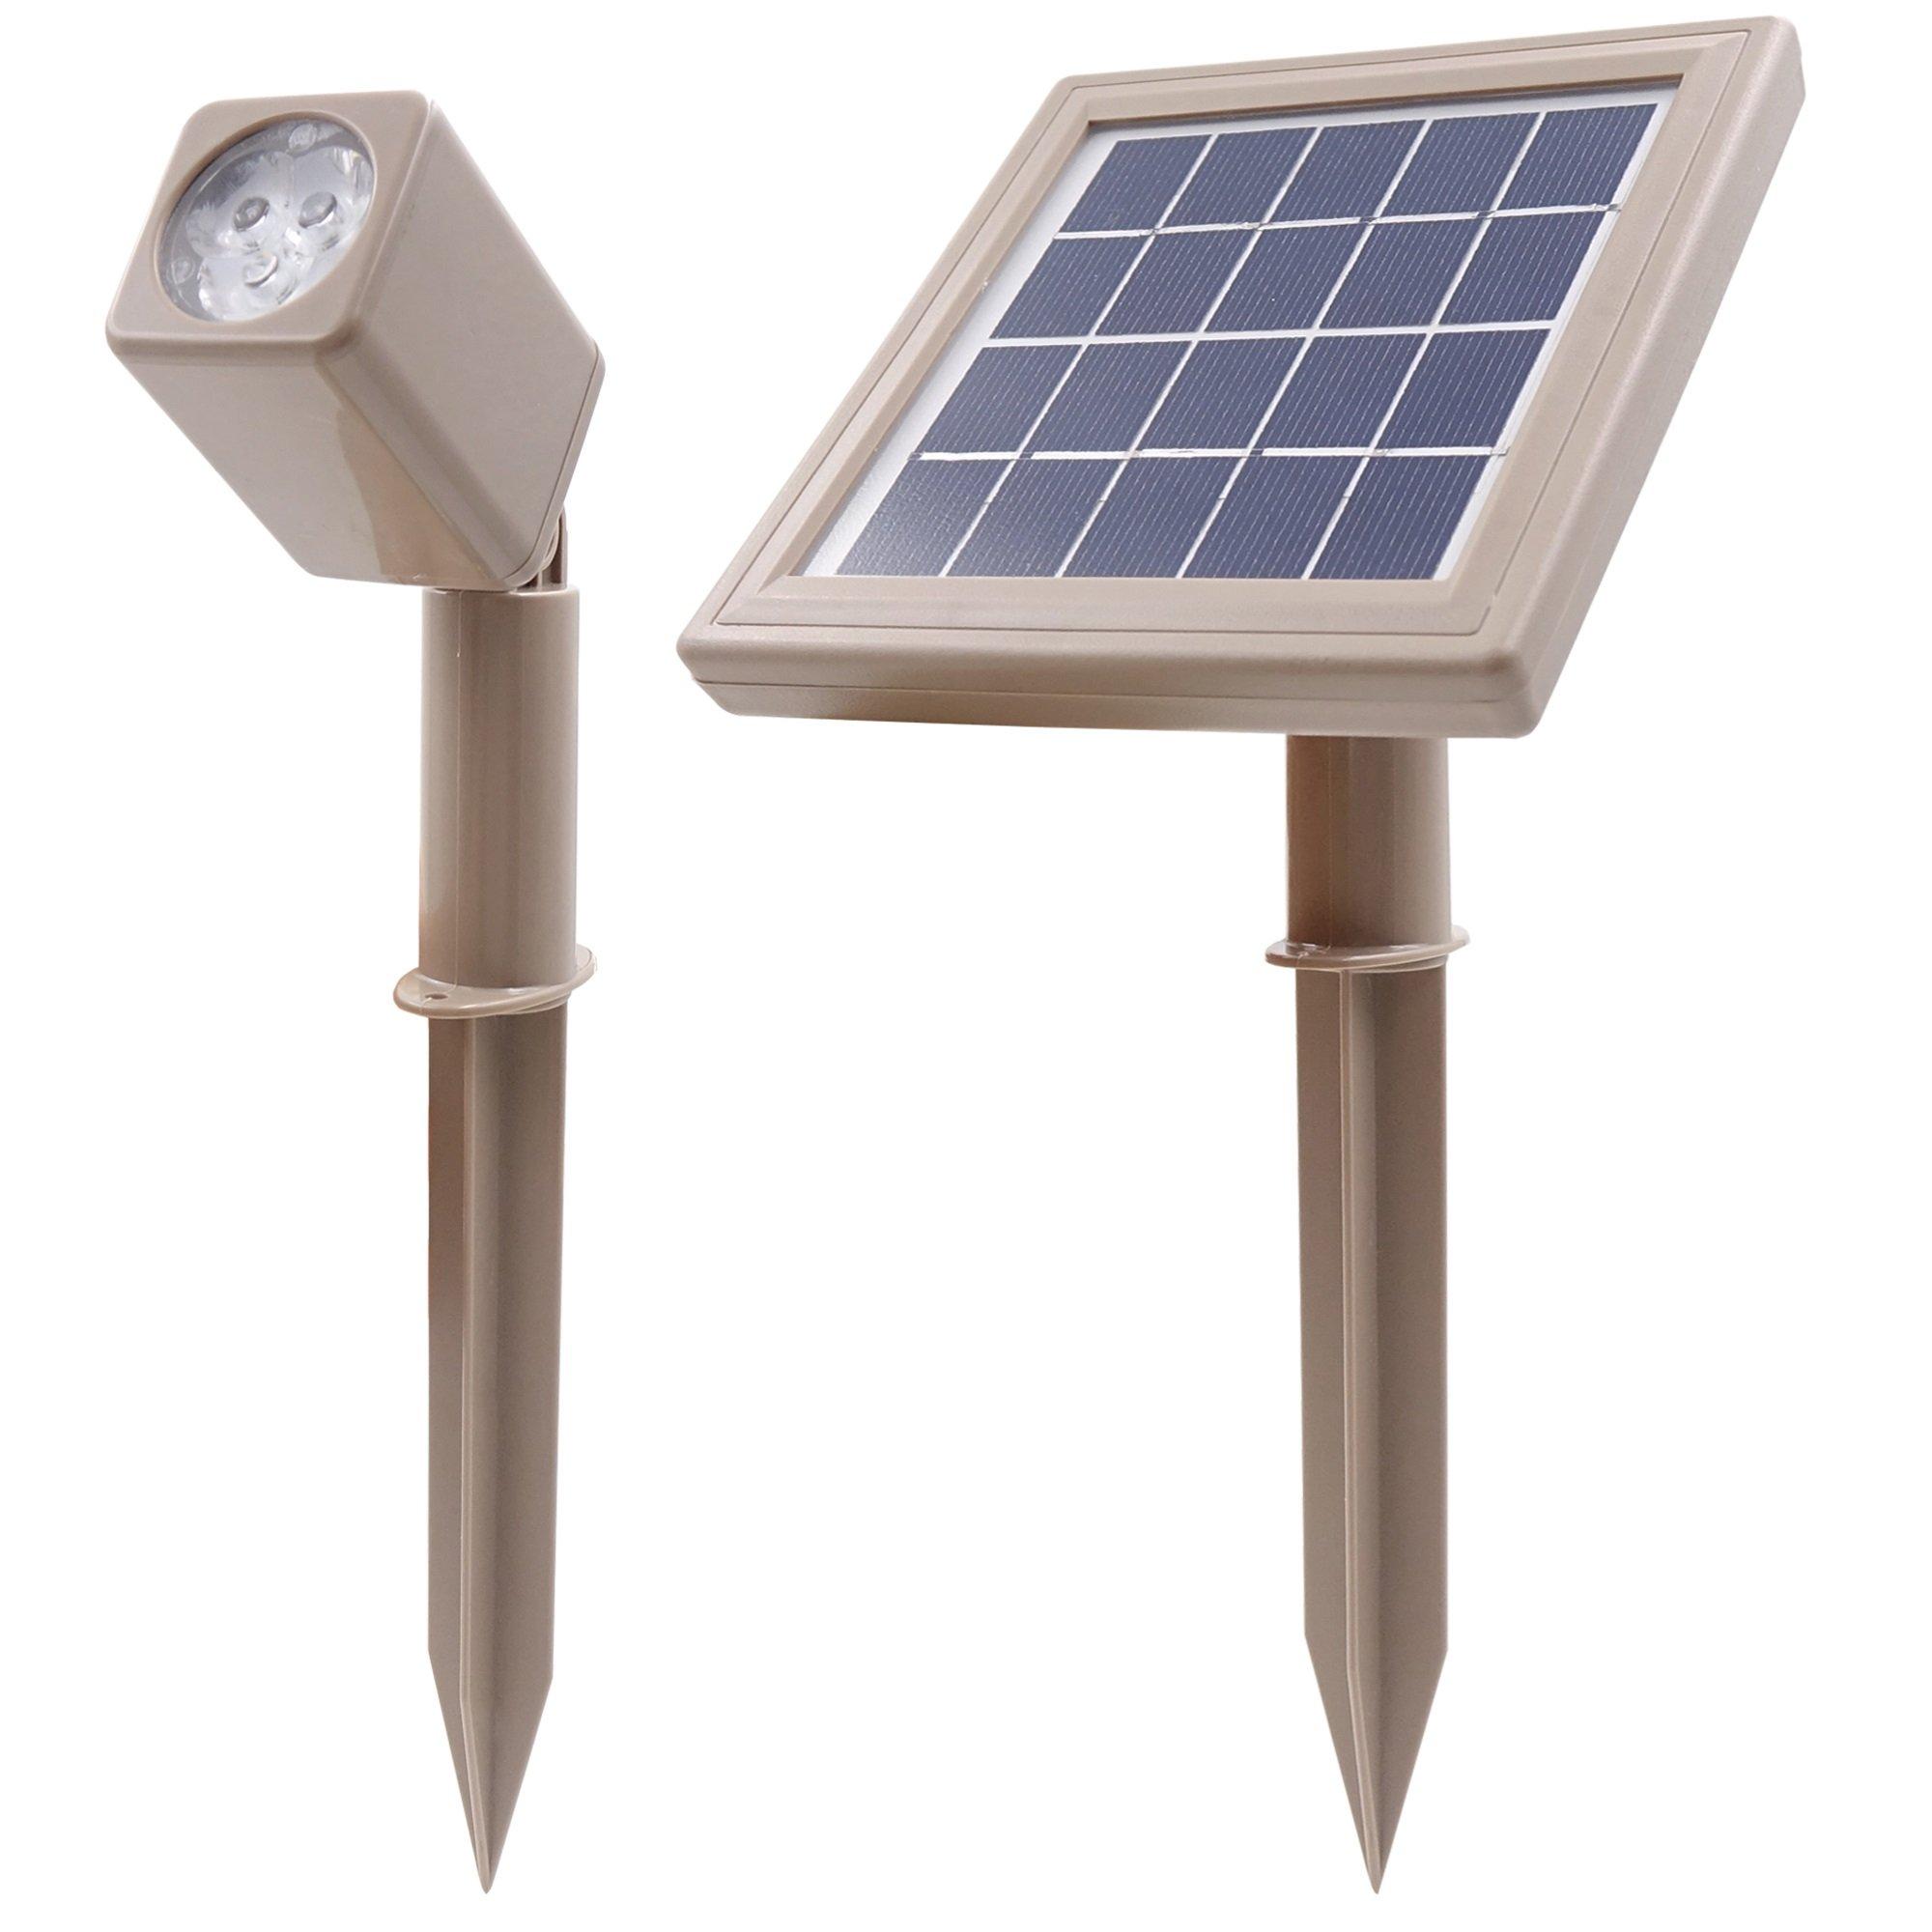 HEX 50X Single Solar Spotlight Warm White LED for Outdoor Garden Yard Landscape Downlight by Solar Light Mart